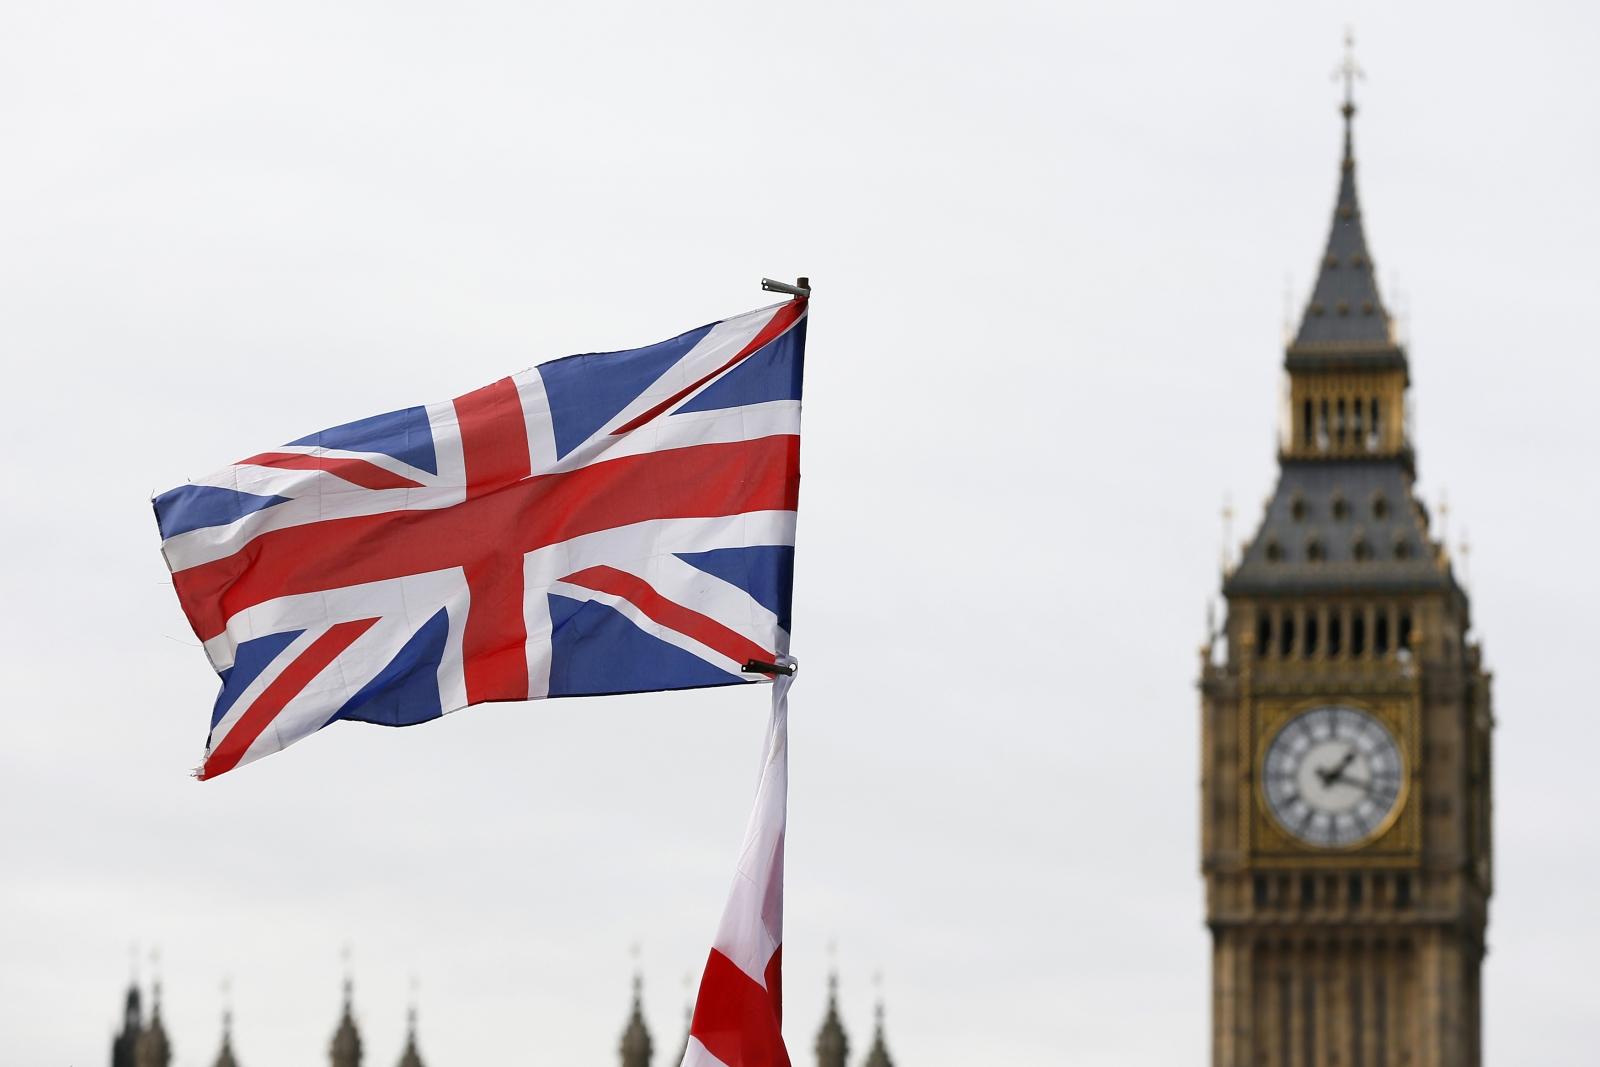 Schede didattiche inglese bandiere: flags